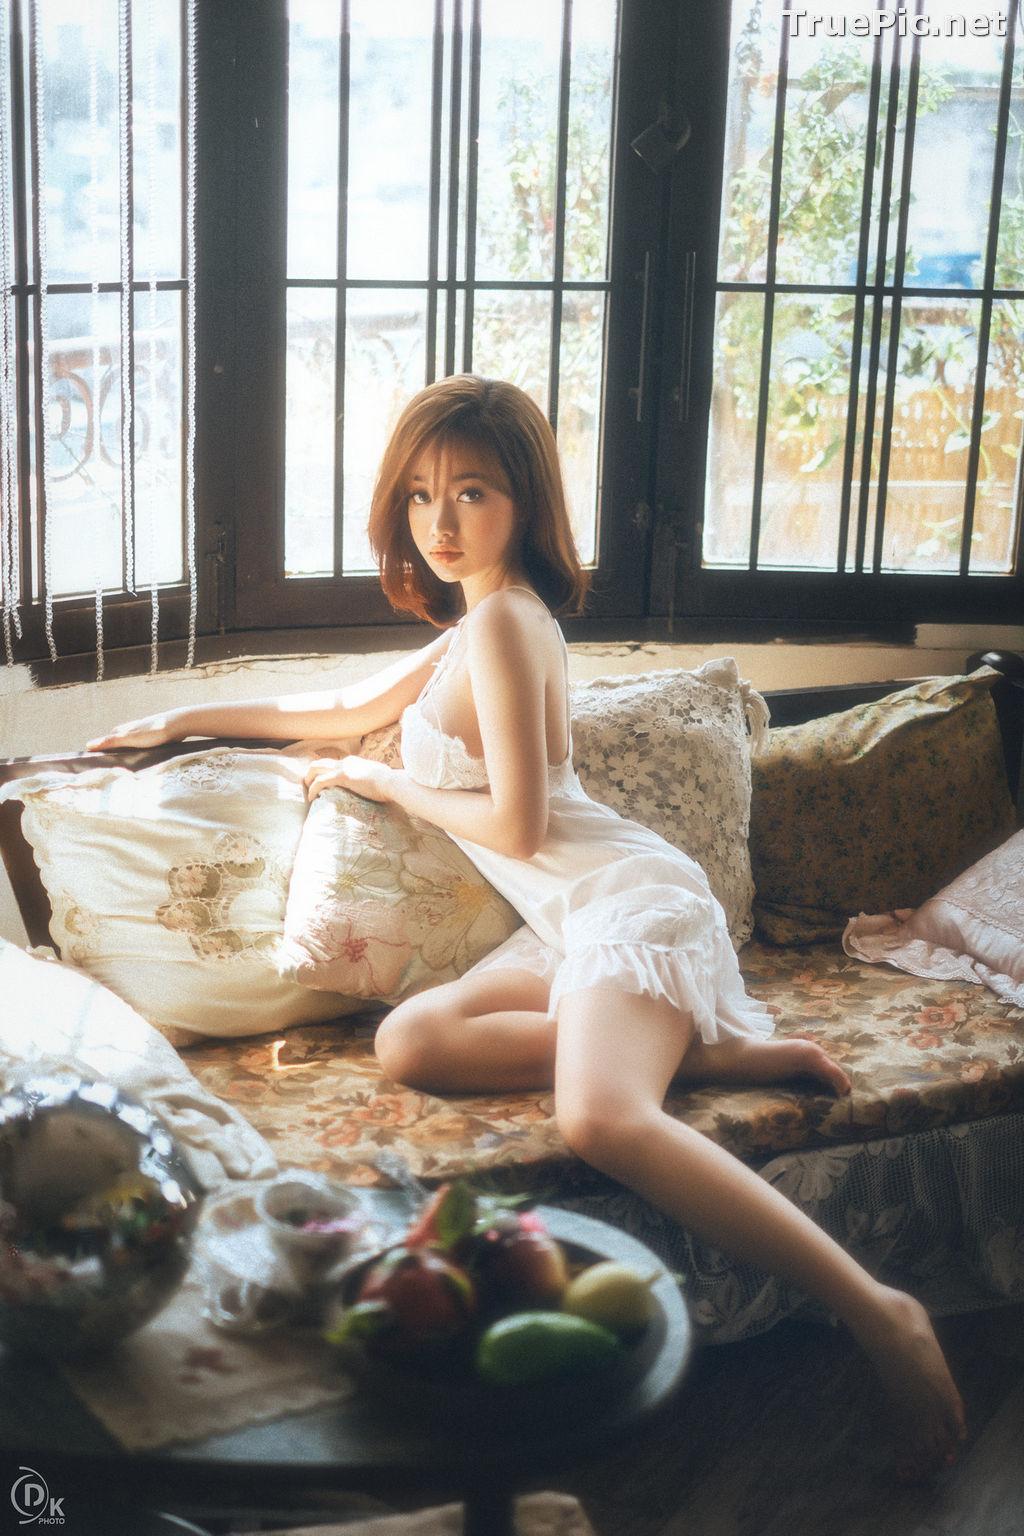 Image Vietnamese Hot Model - Sleepwear and Lingerie Under Dawnlight - TruePic.net - Picture-1